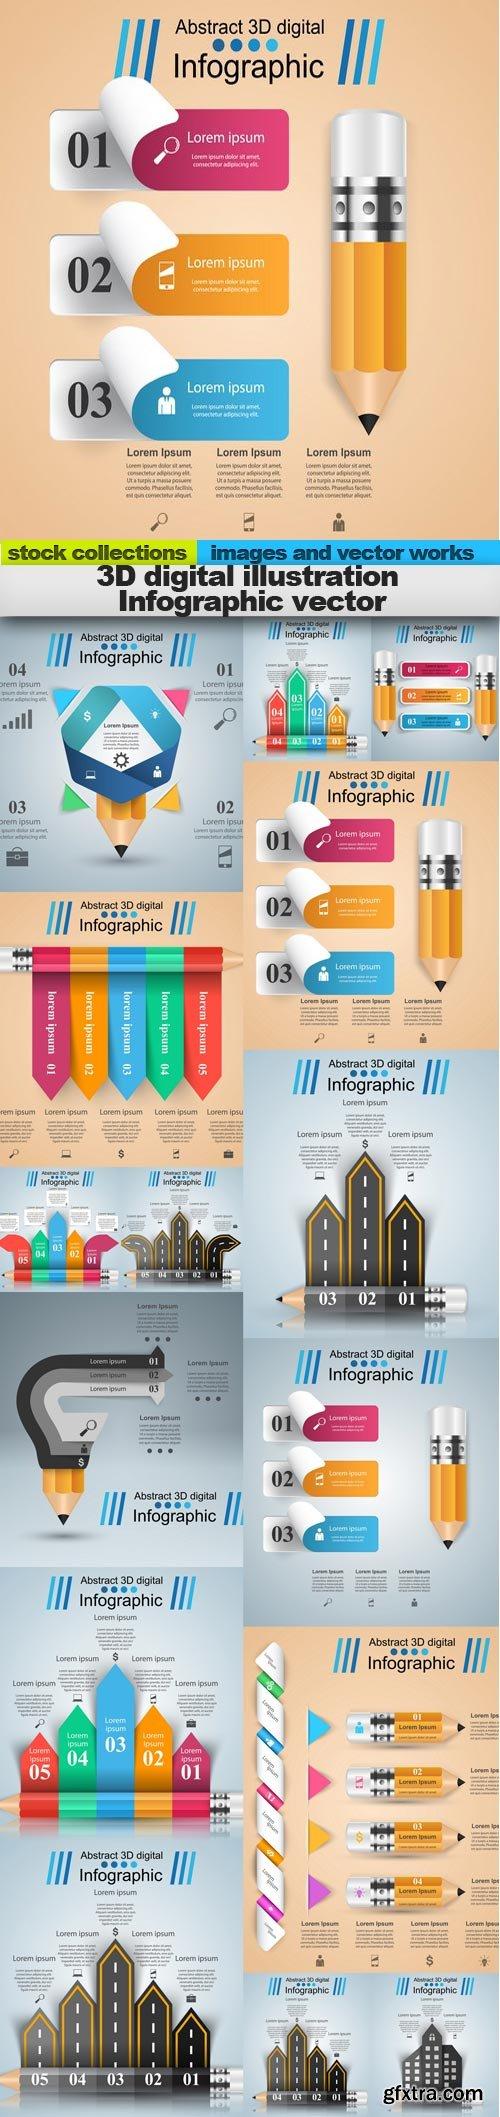 3D digital illustration Infographic vector, 15 x EPS